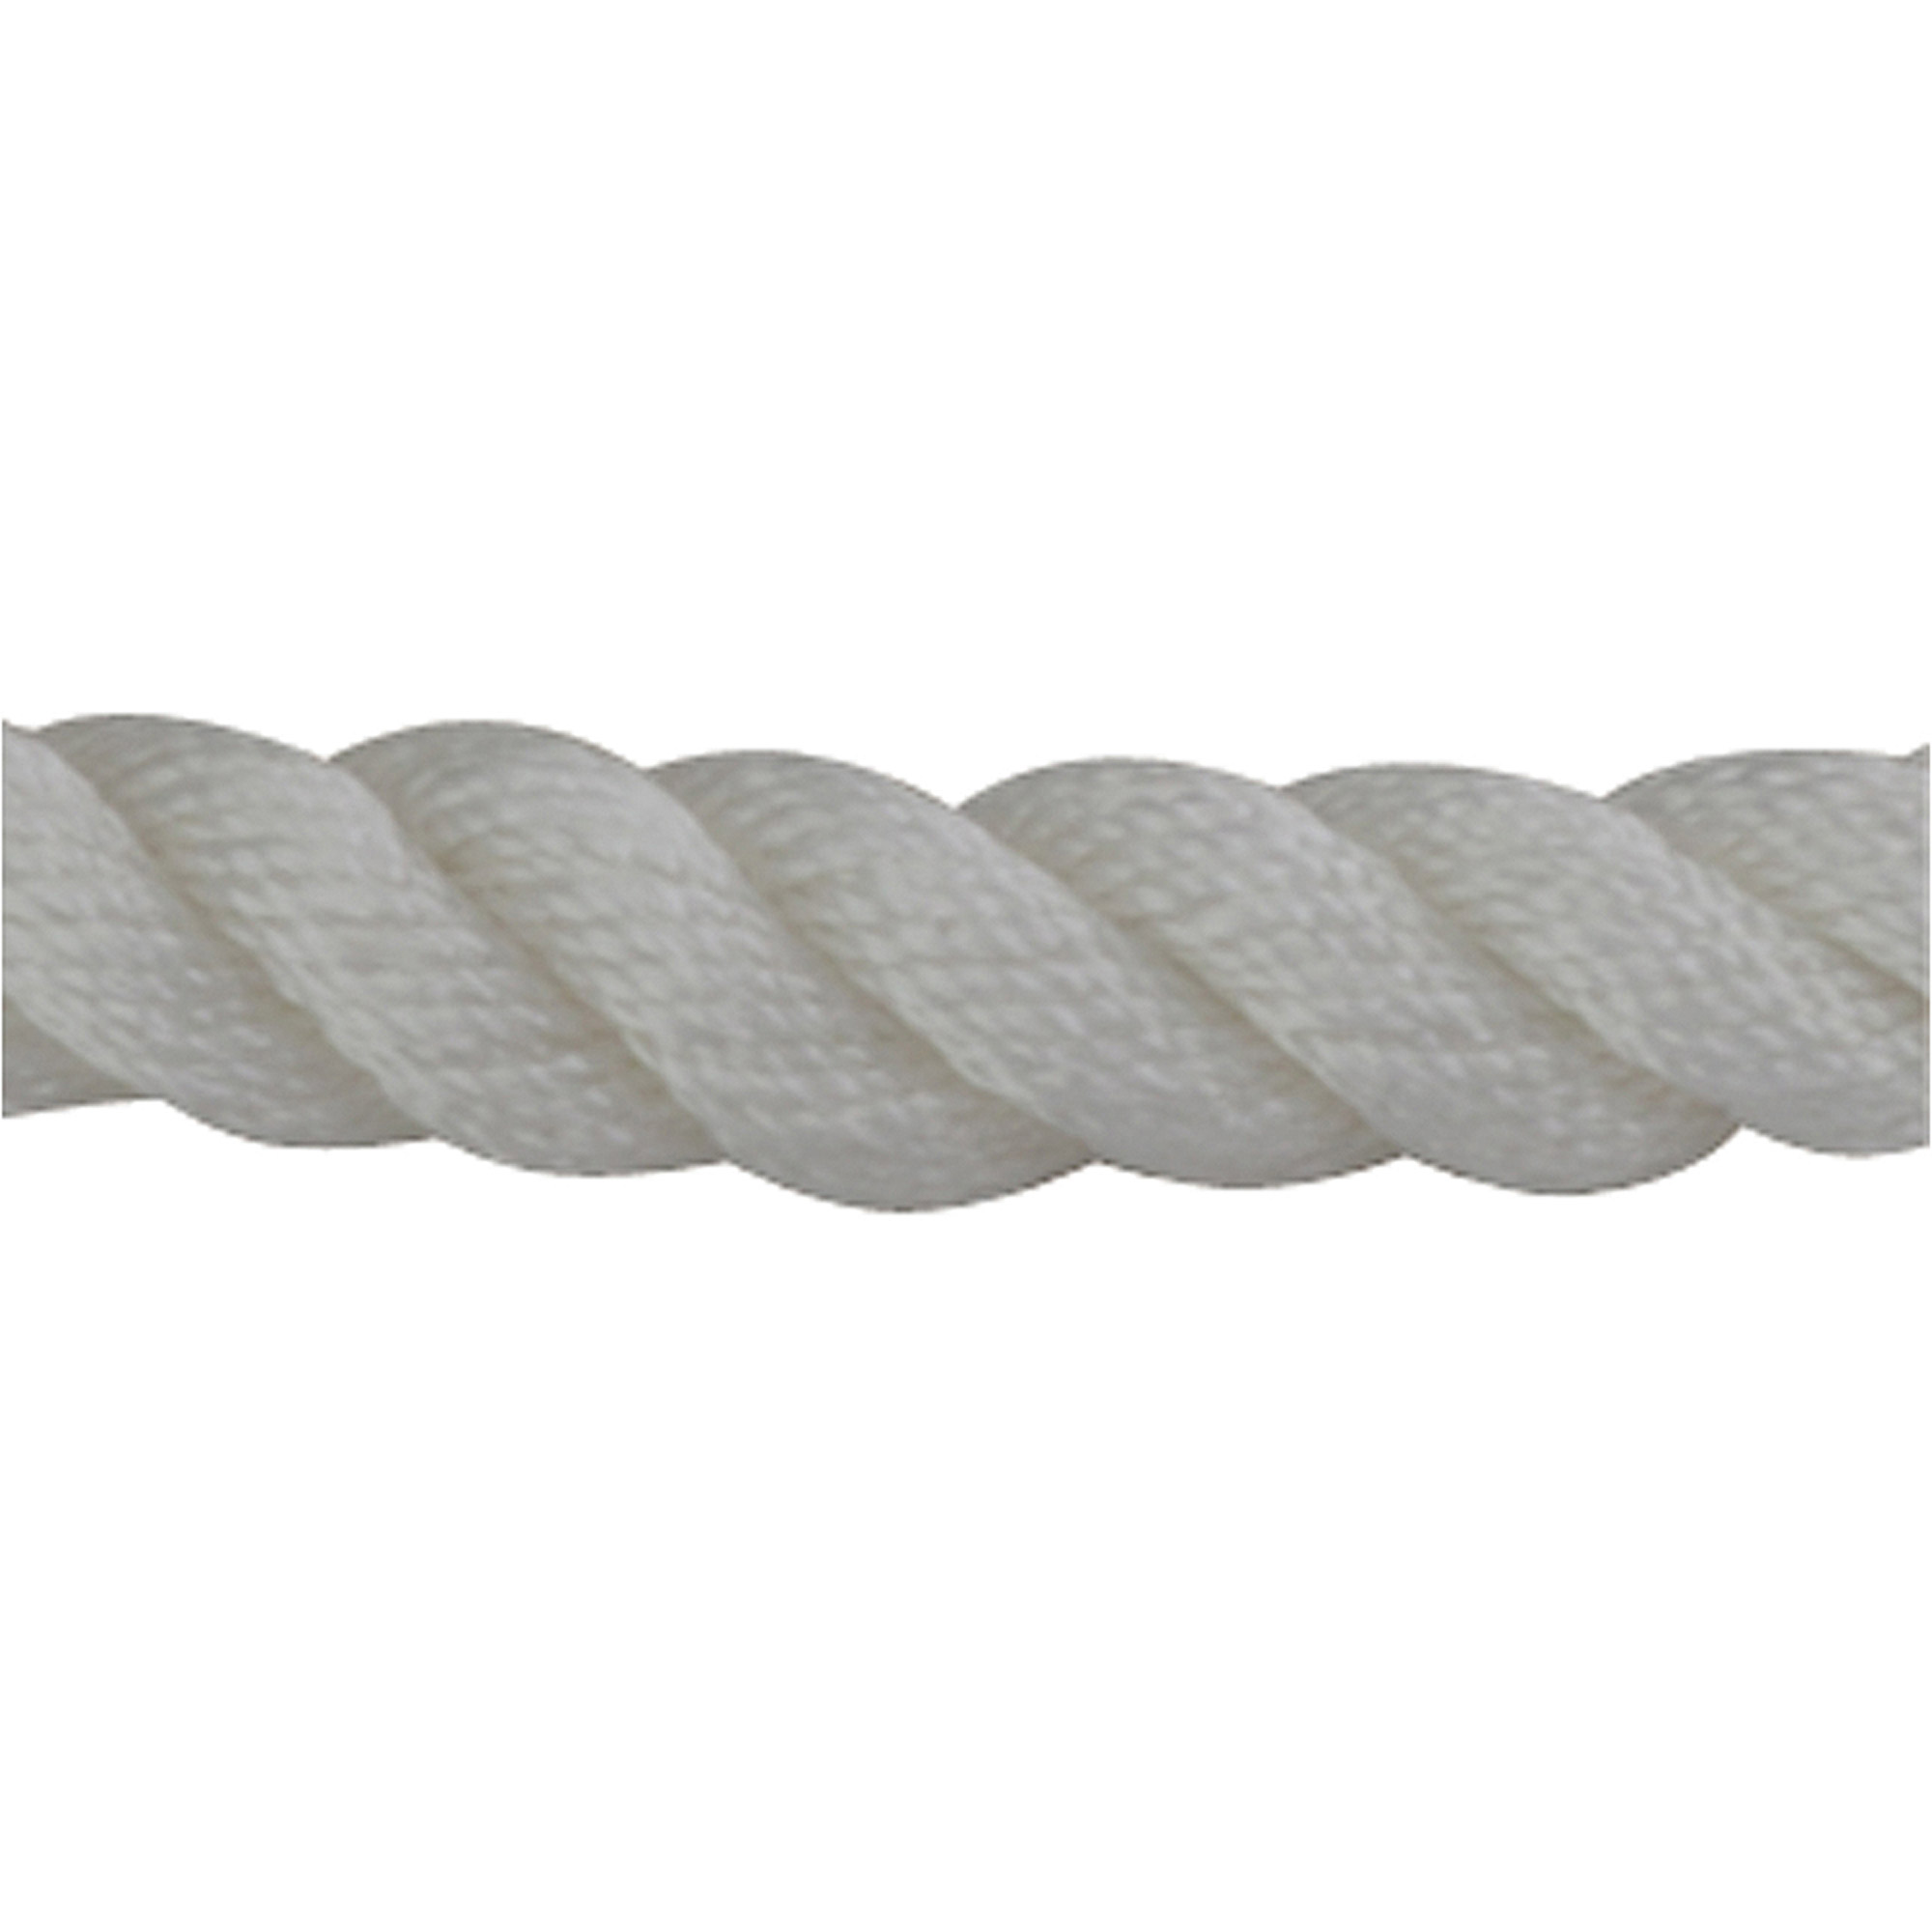 "Sea Dog Dock Line, Twisted Nylon, 3/8"" x 10', White"